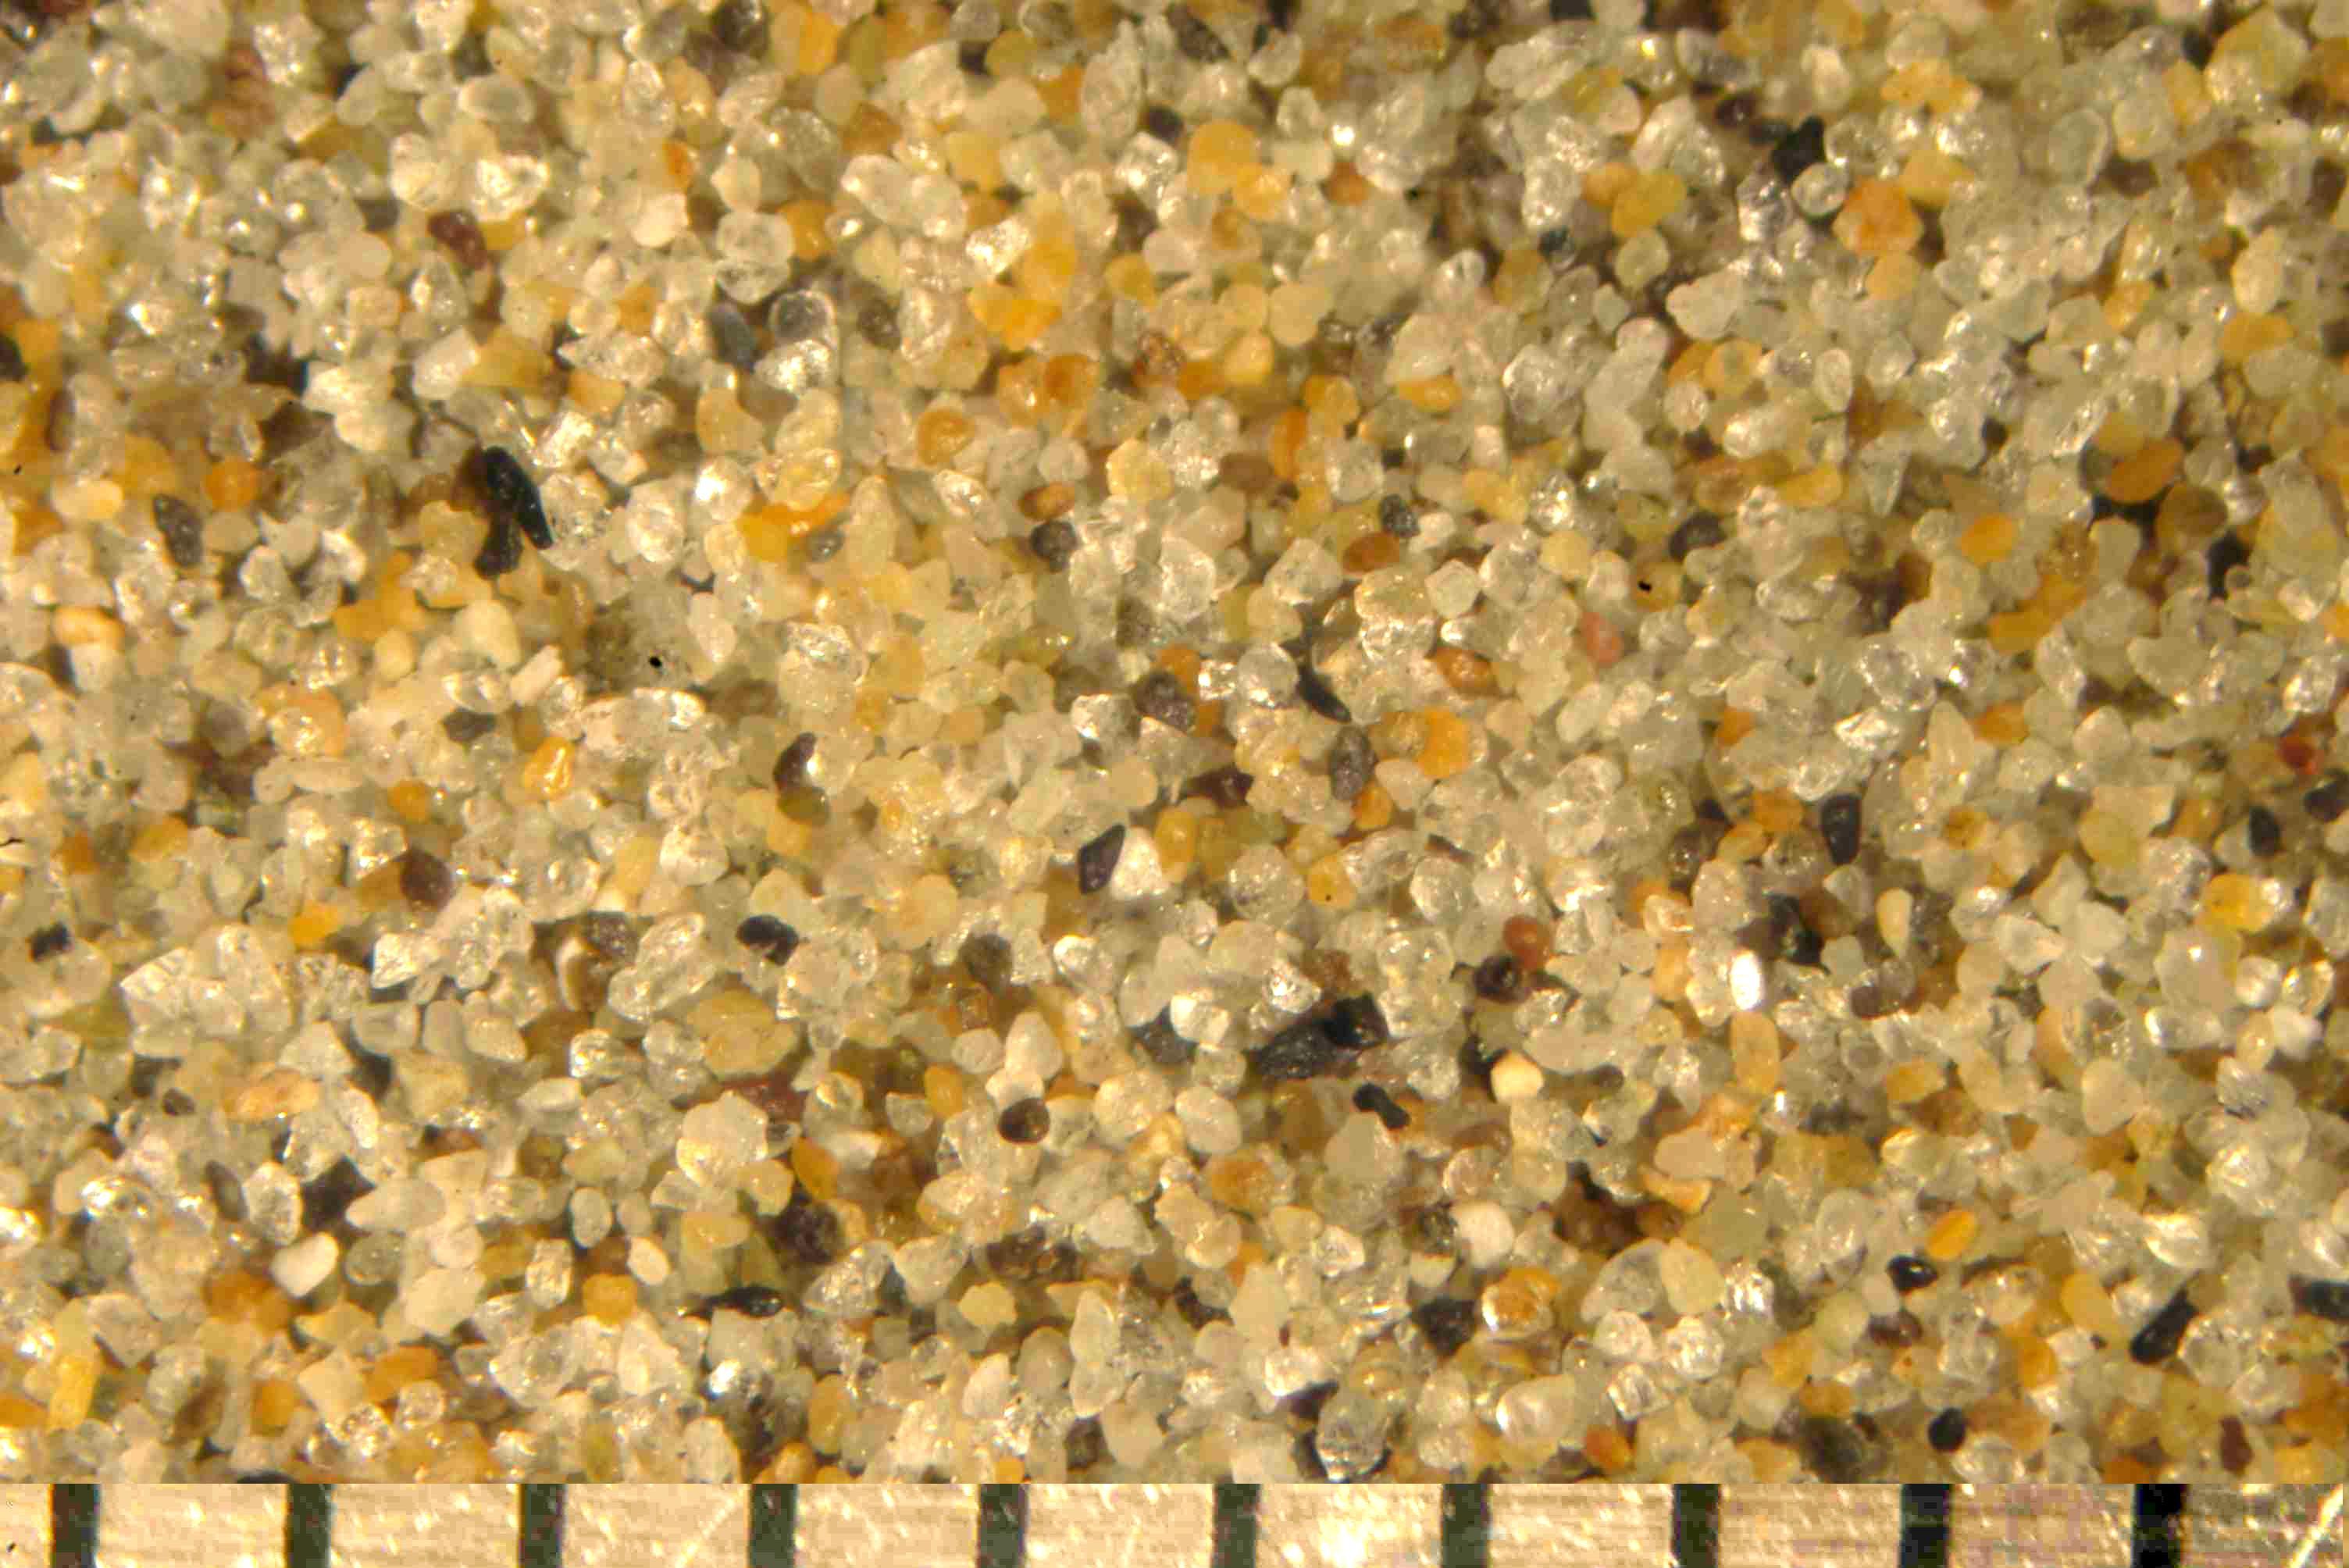 Sand cannon beach oregon for Soil under microscope